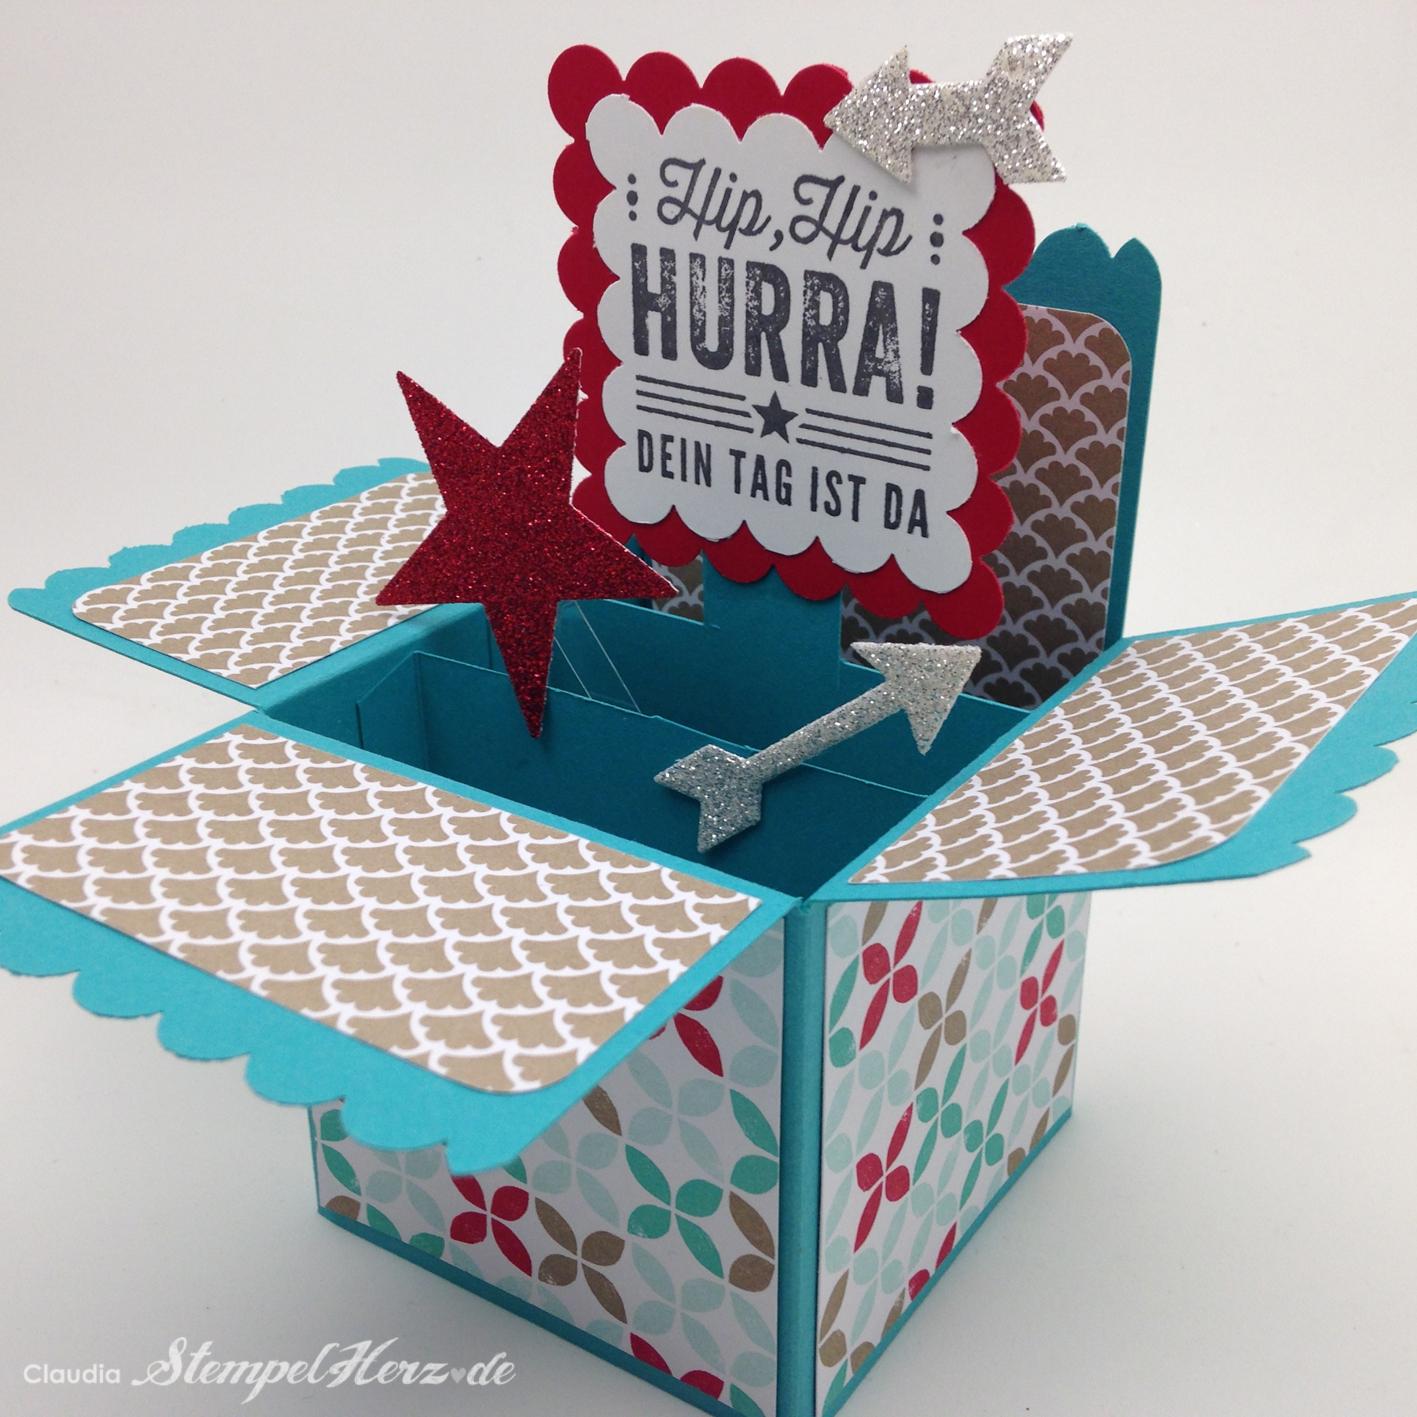 Stampin Up - Stempelherz - Kartenbox - Geburtstagskarte - Kartenset ...